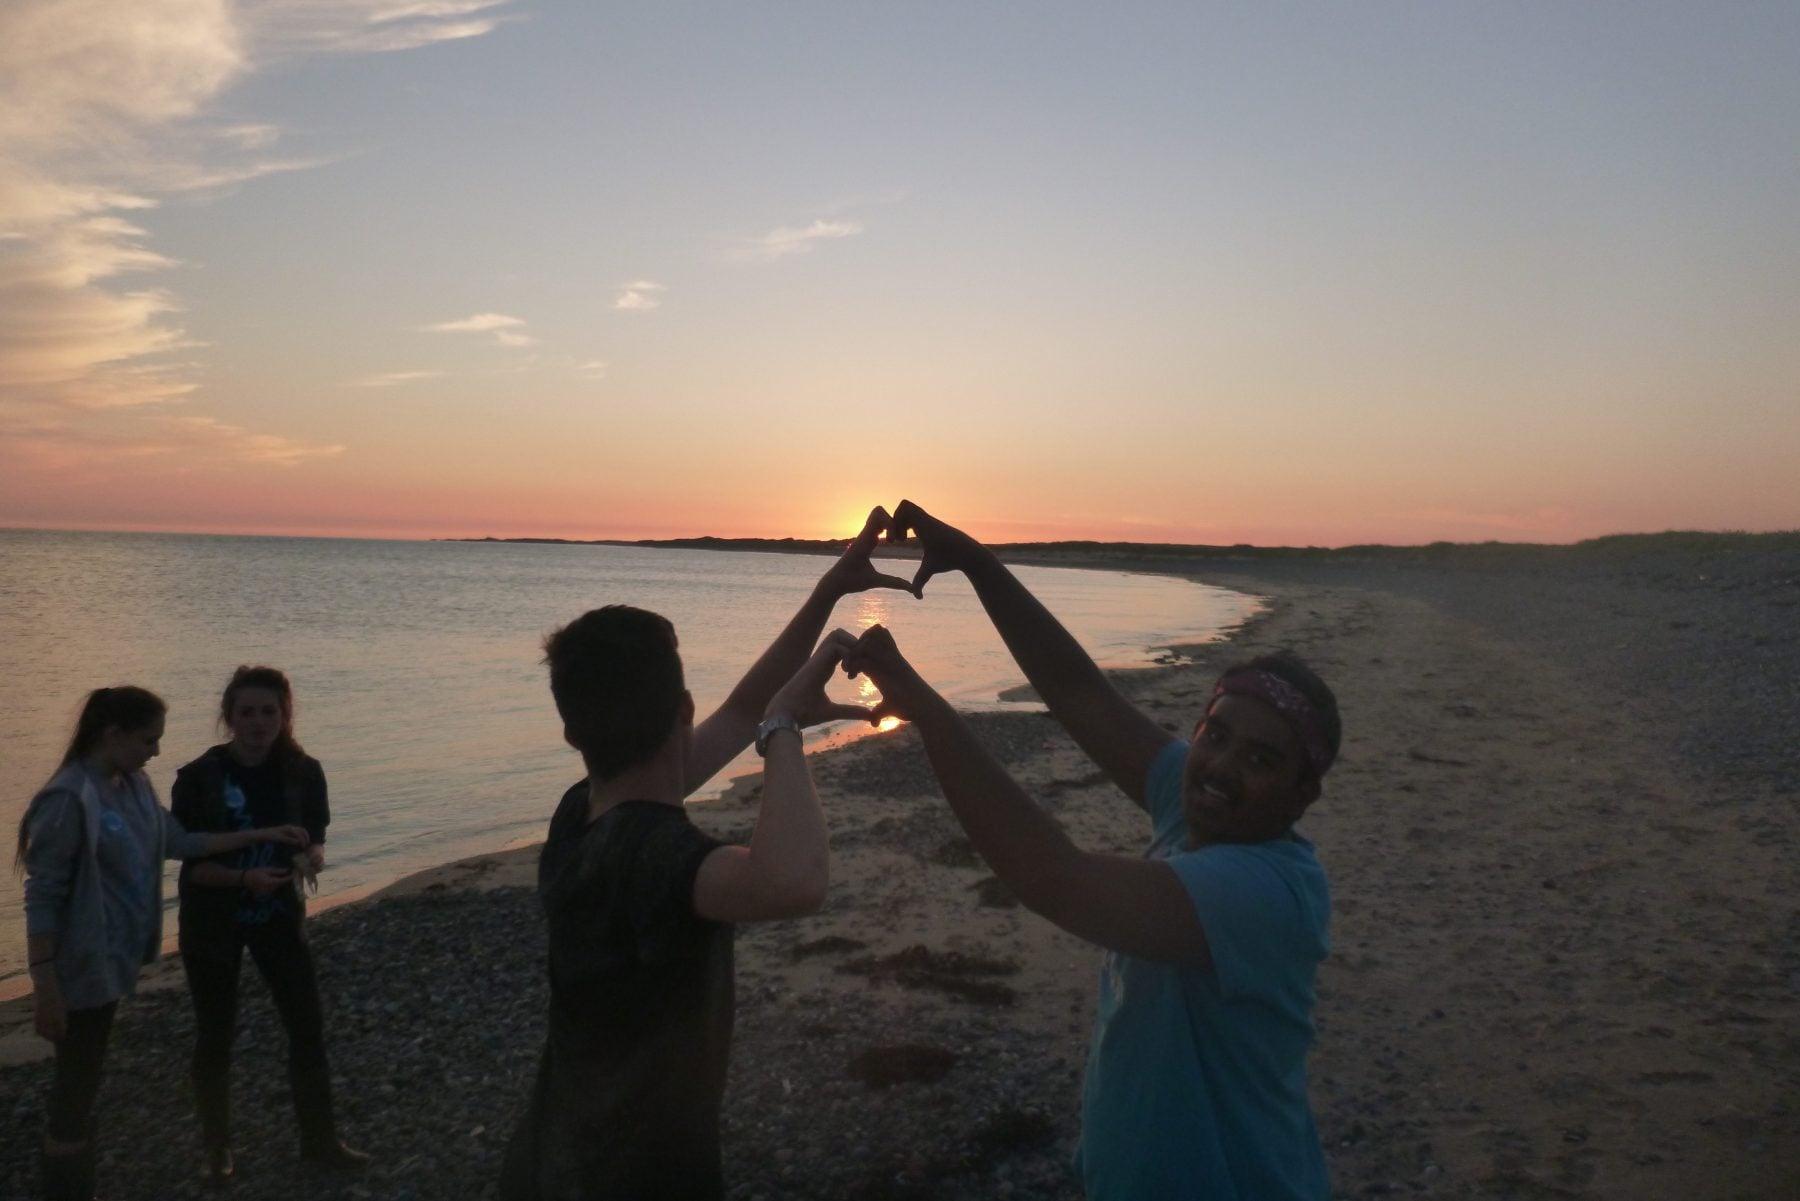 Sunset beach, team building, heart symbol